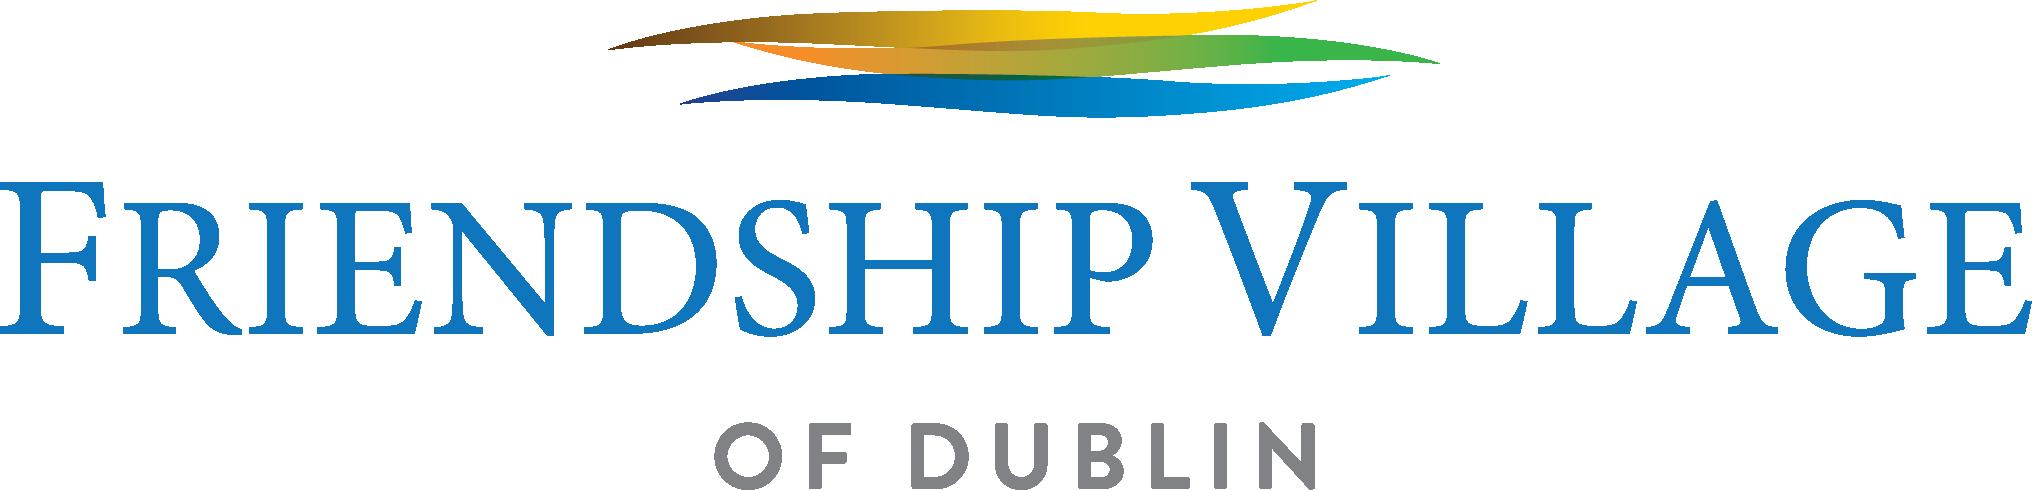 Friendship Village Of Dublin Ohio logo